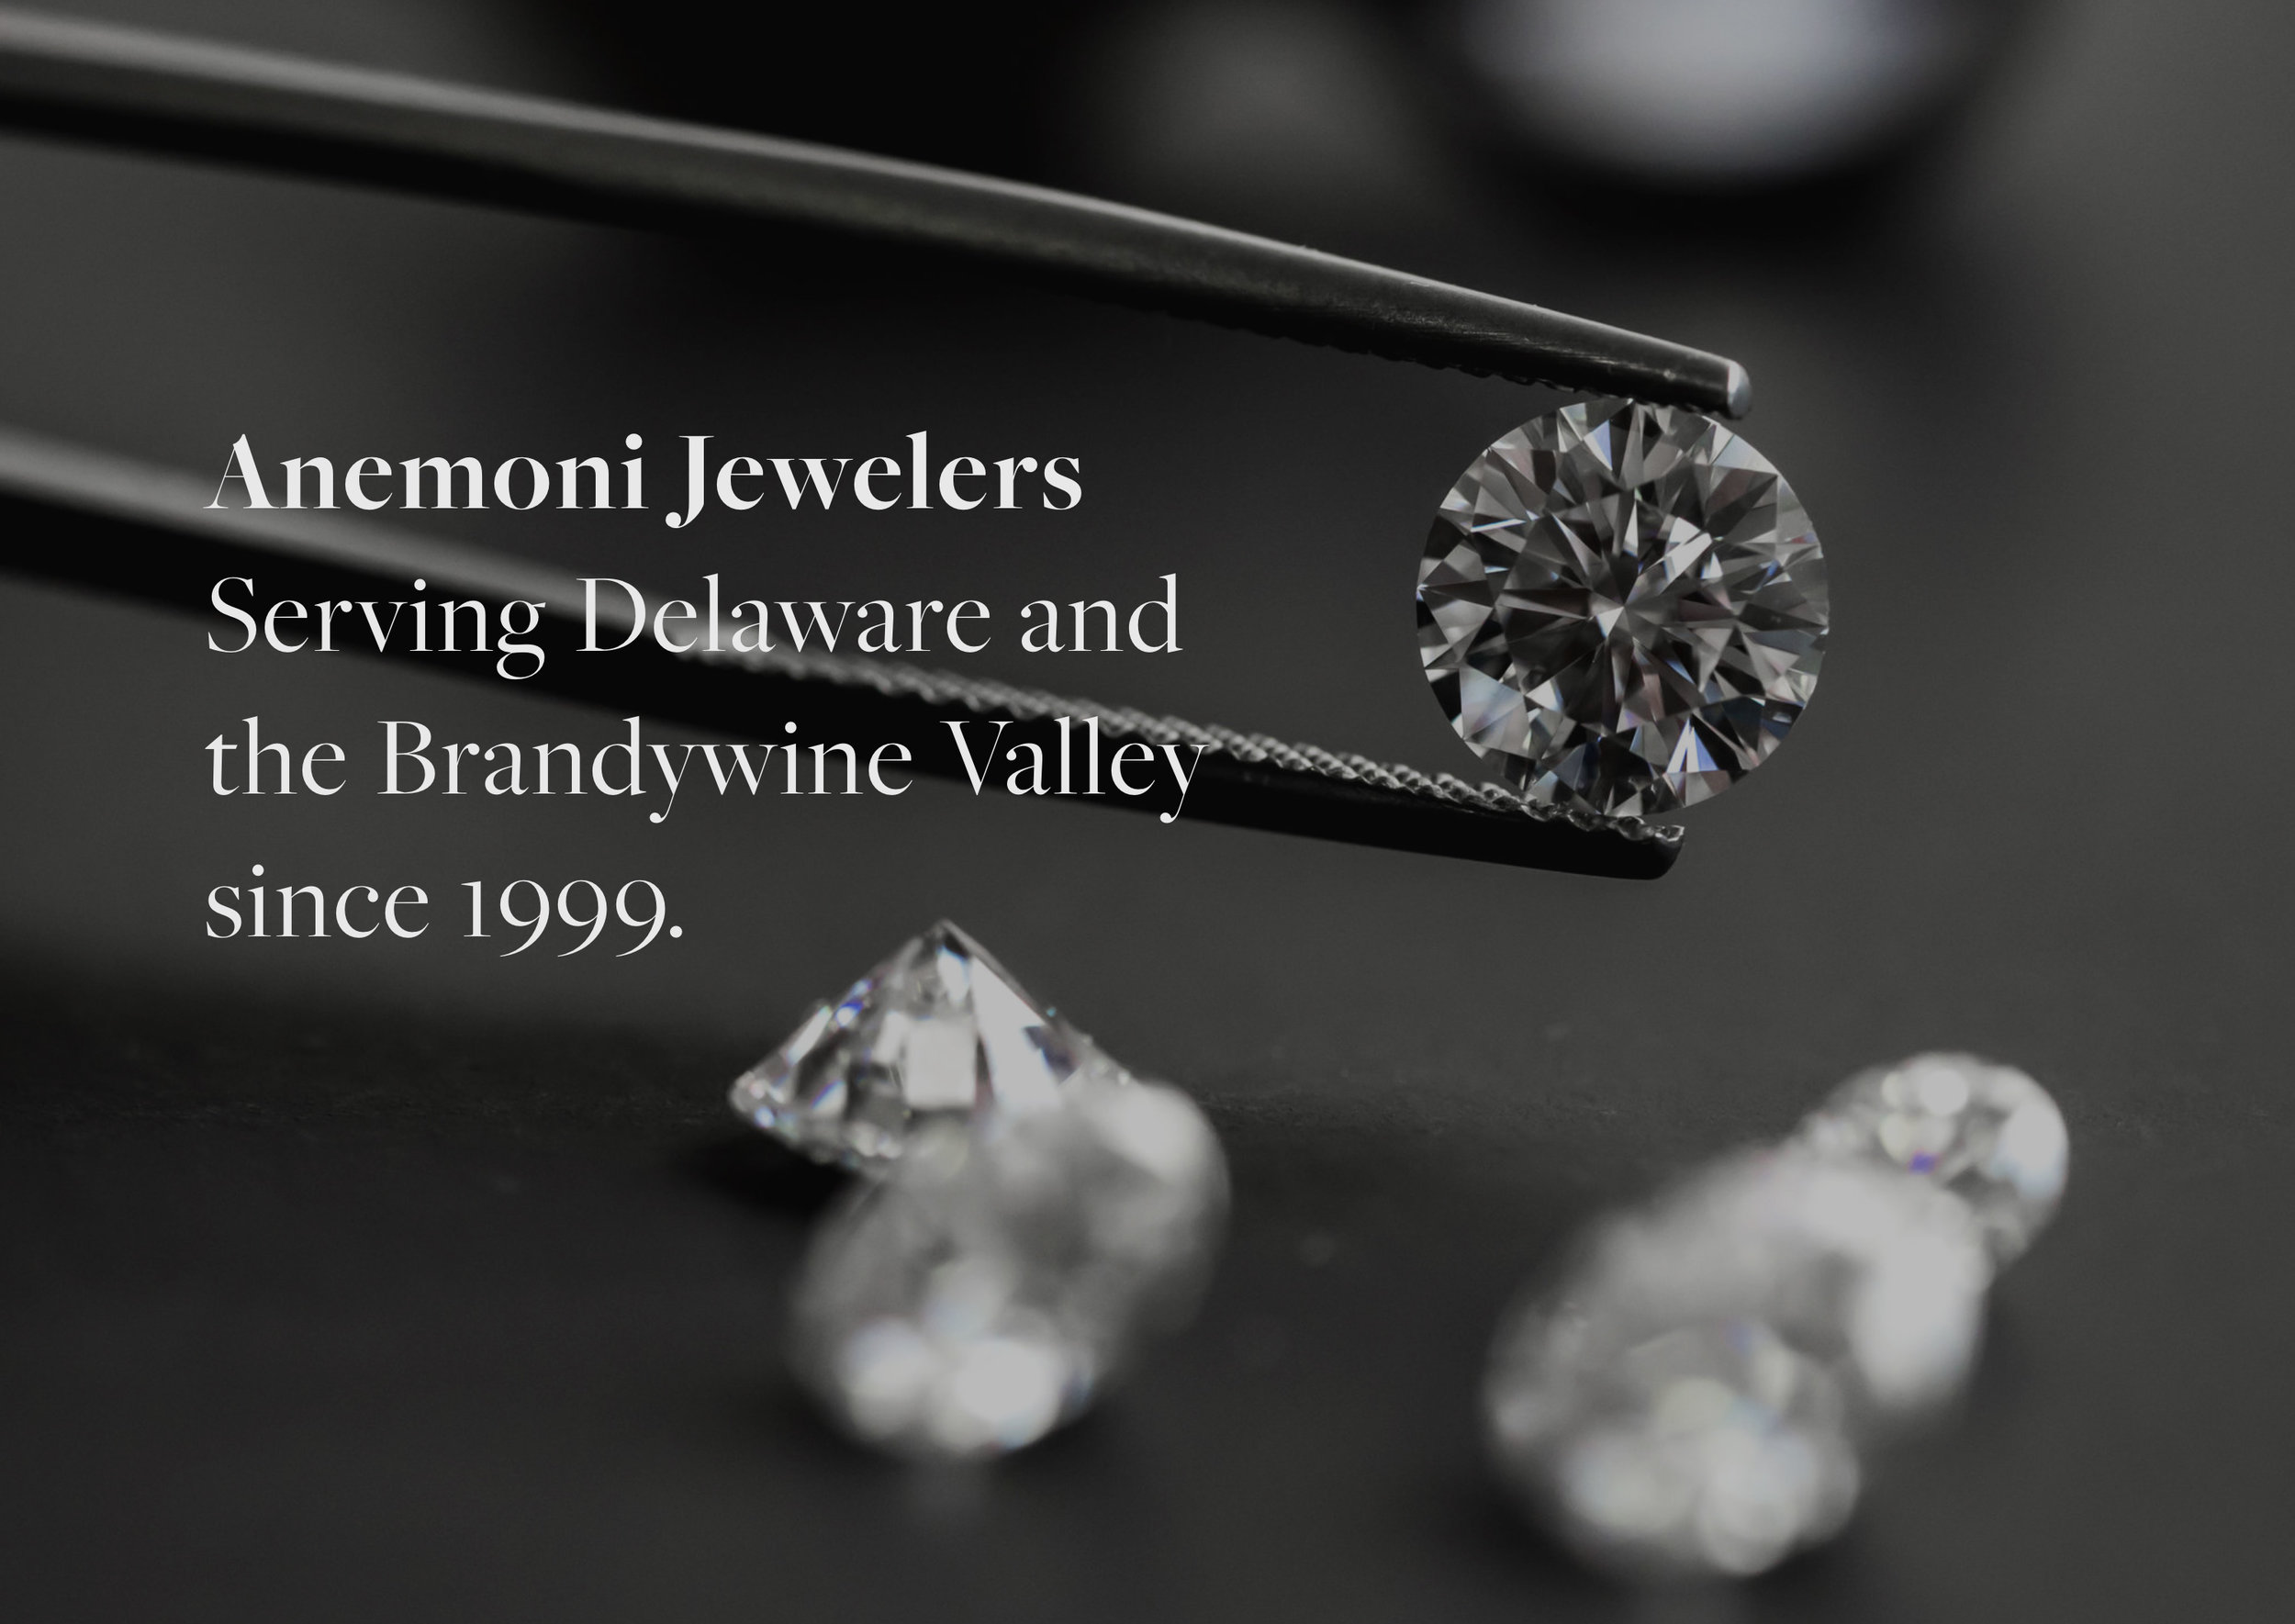 Anemoni-Jewelers-Homepage-Web-Title-Design.jpg